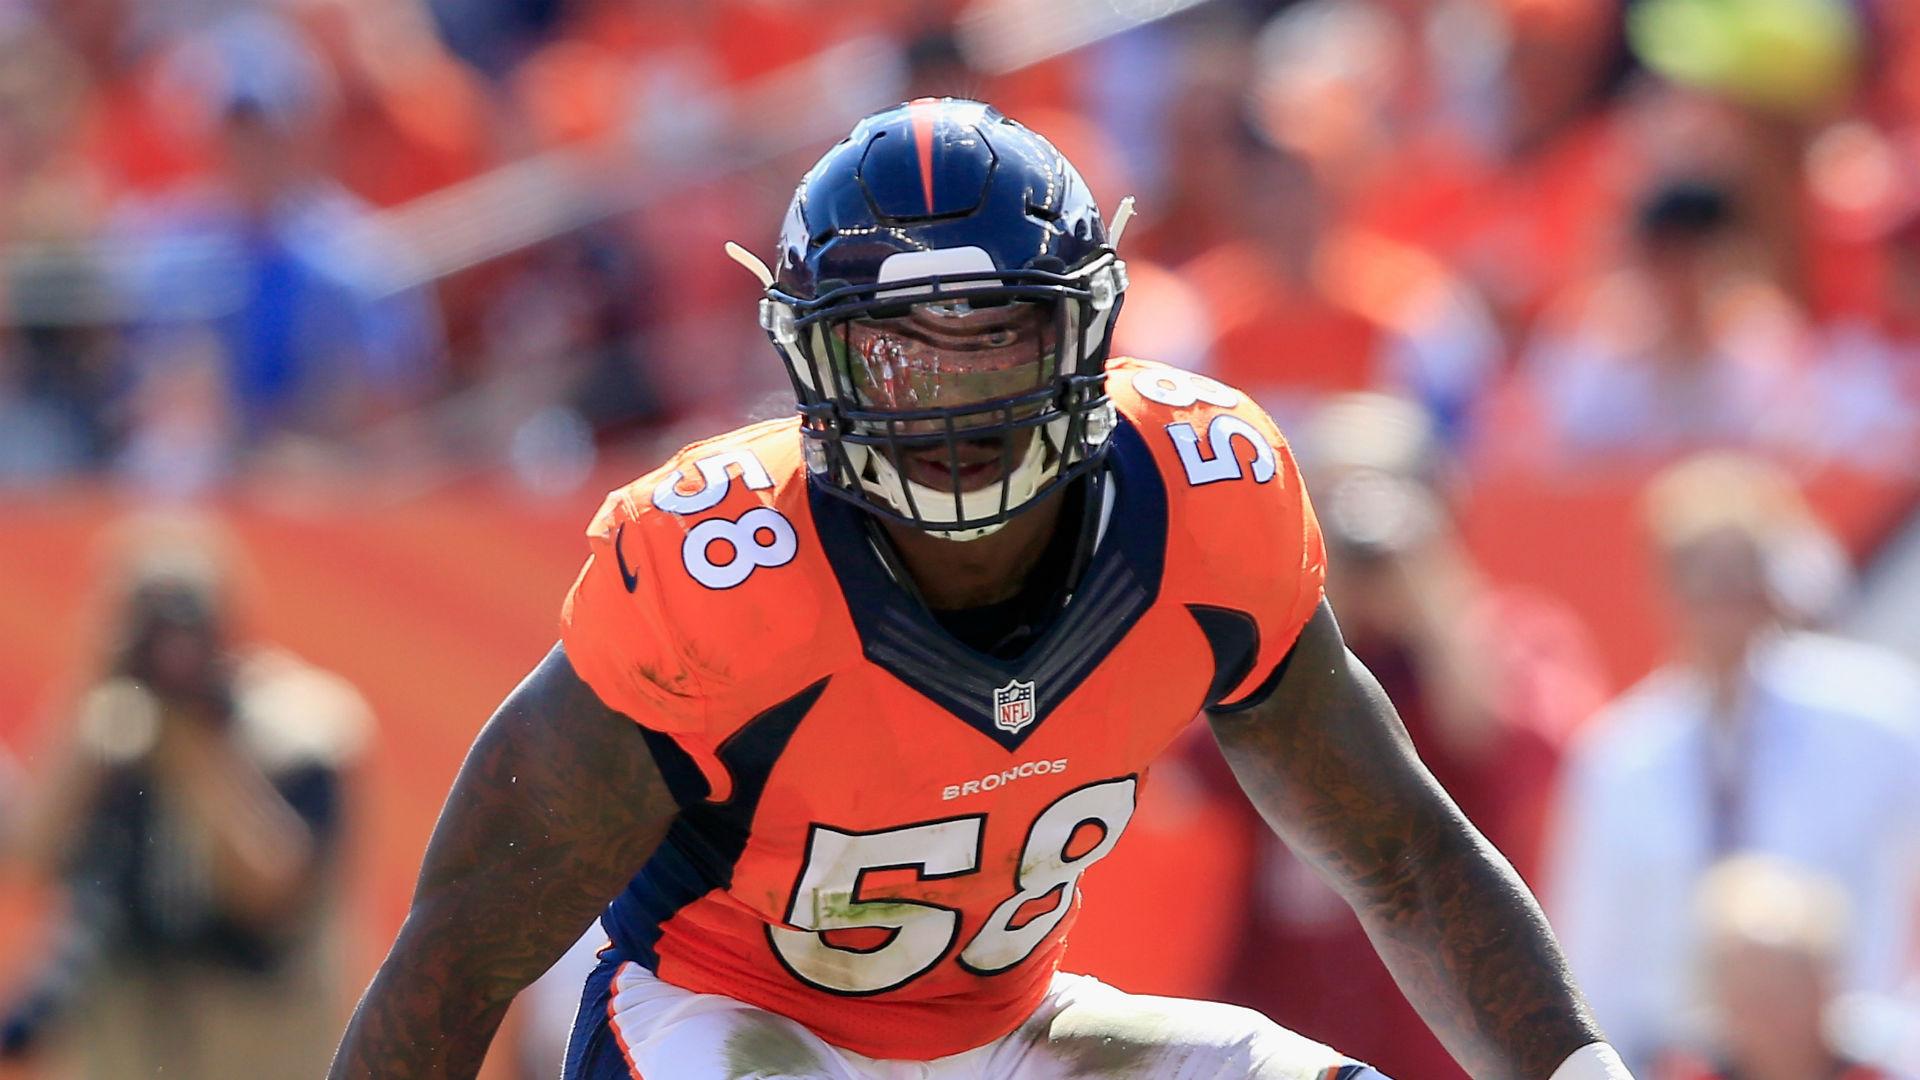 Von Miller, Broncos end ugly dispute